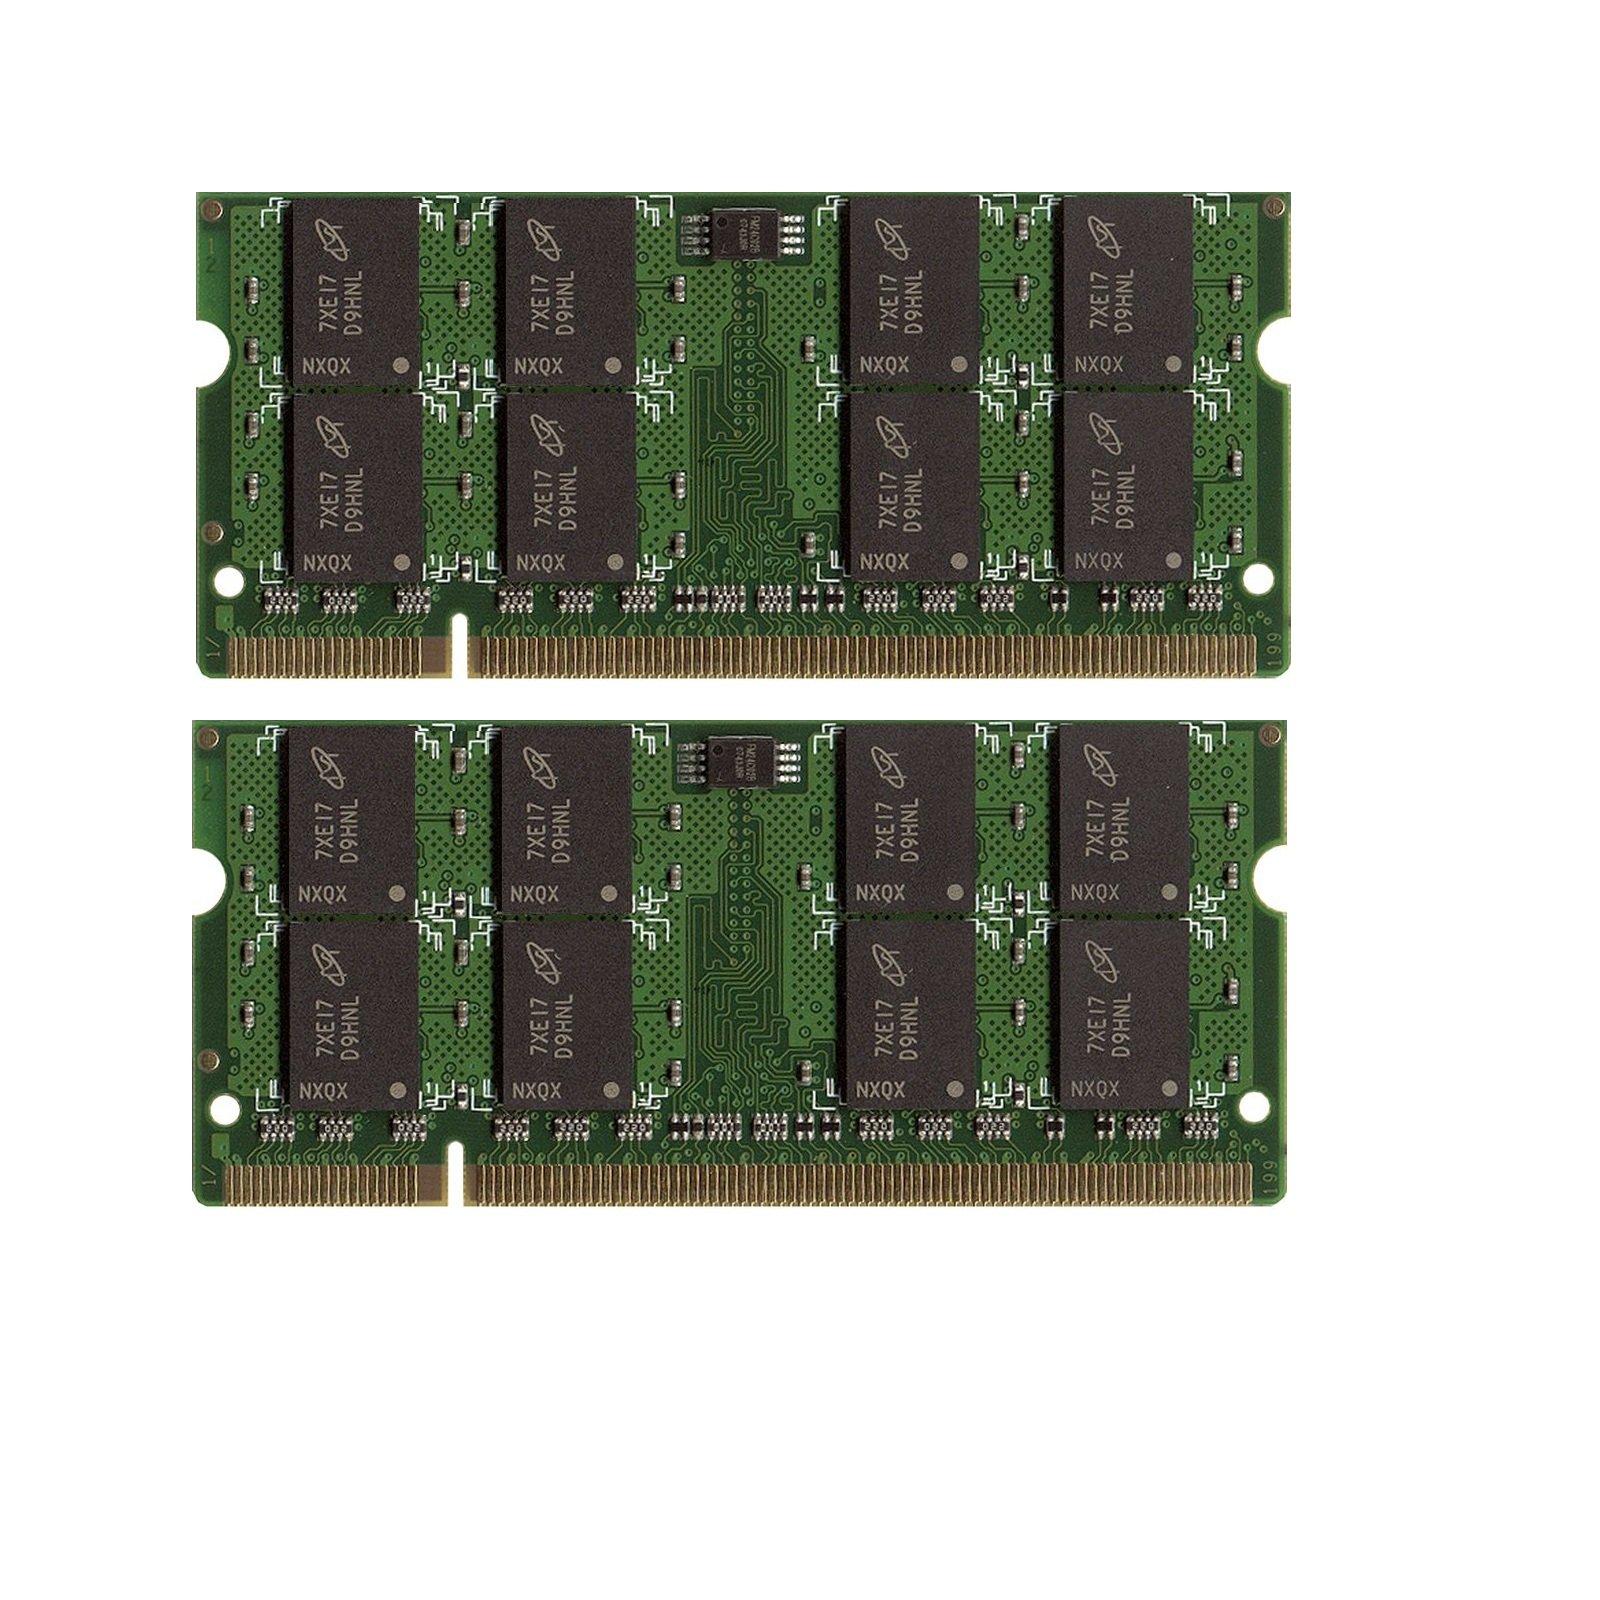 New! 4GB (2X2GB) DDR2-800 SODIMM   Memoria PC2-6400